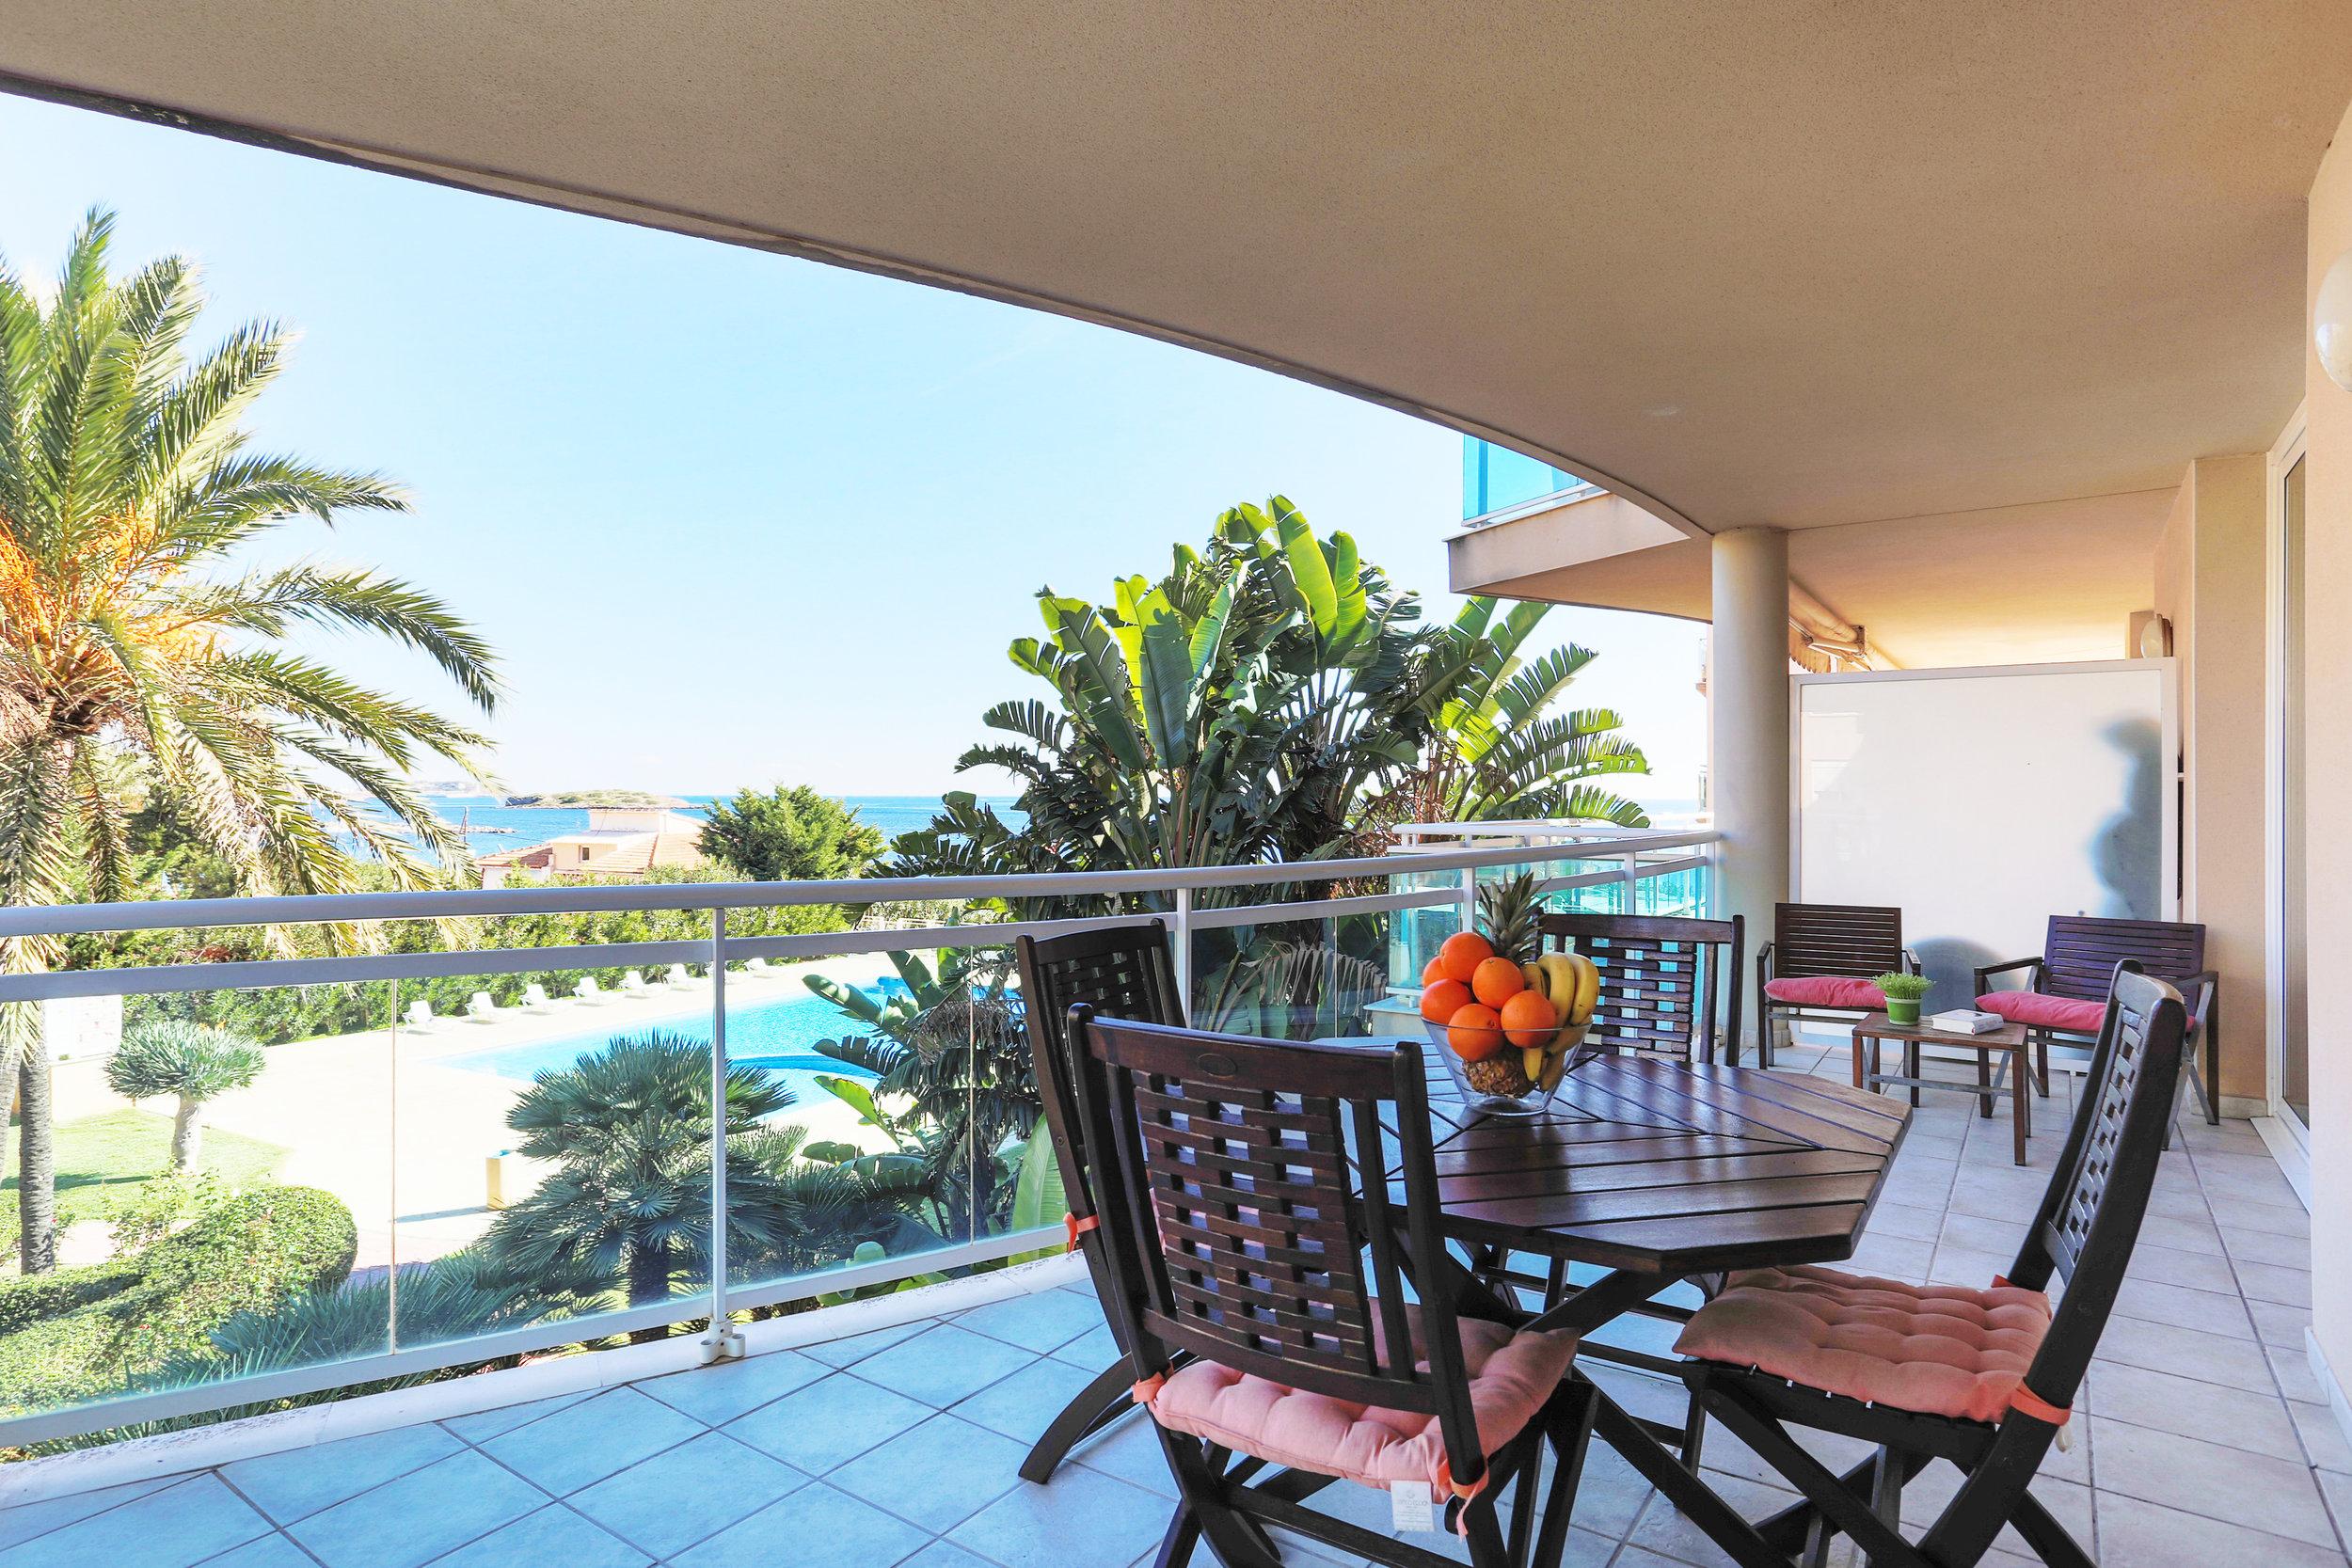 Bossa Sol 1-2-4 - €18,000 for May to October2 bedroom, 2 bathroom Playa d'en Bossa apartment with sea views